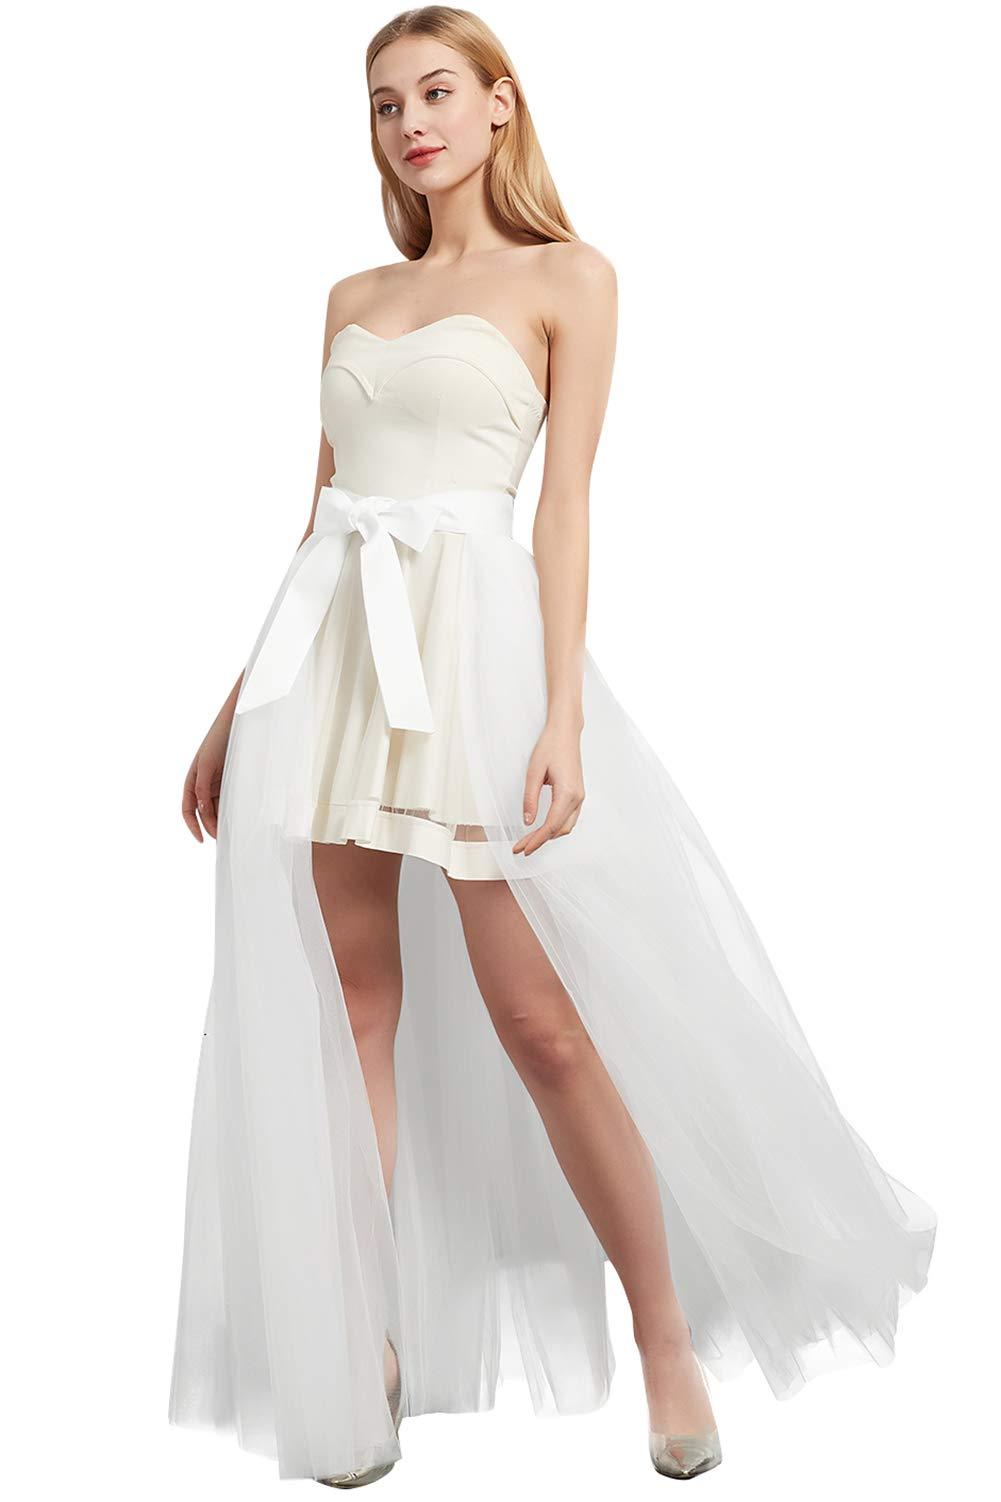 Women Wedding Maxi Tulle Skirts Detachable Train Overskirt Overlay Long Bridal